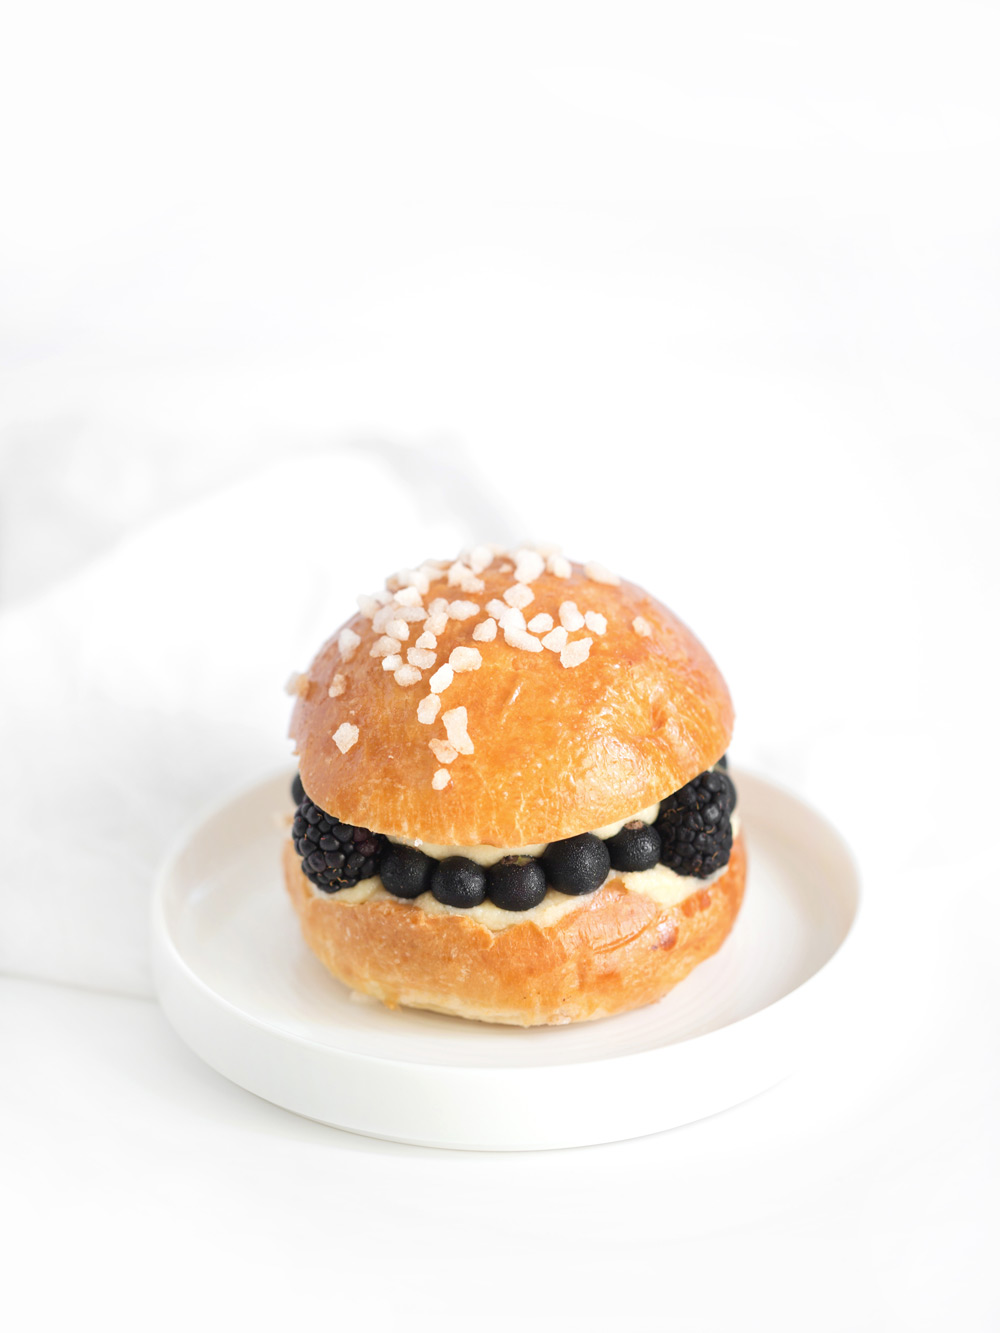 Blanccoco_Recette_Burgers_Dessert_Myrtilles_Mures_5